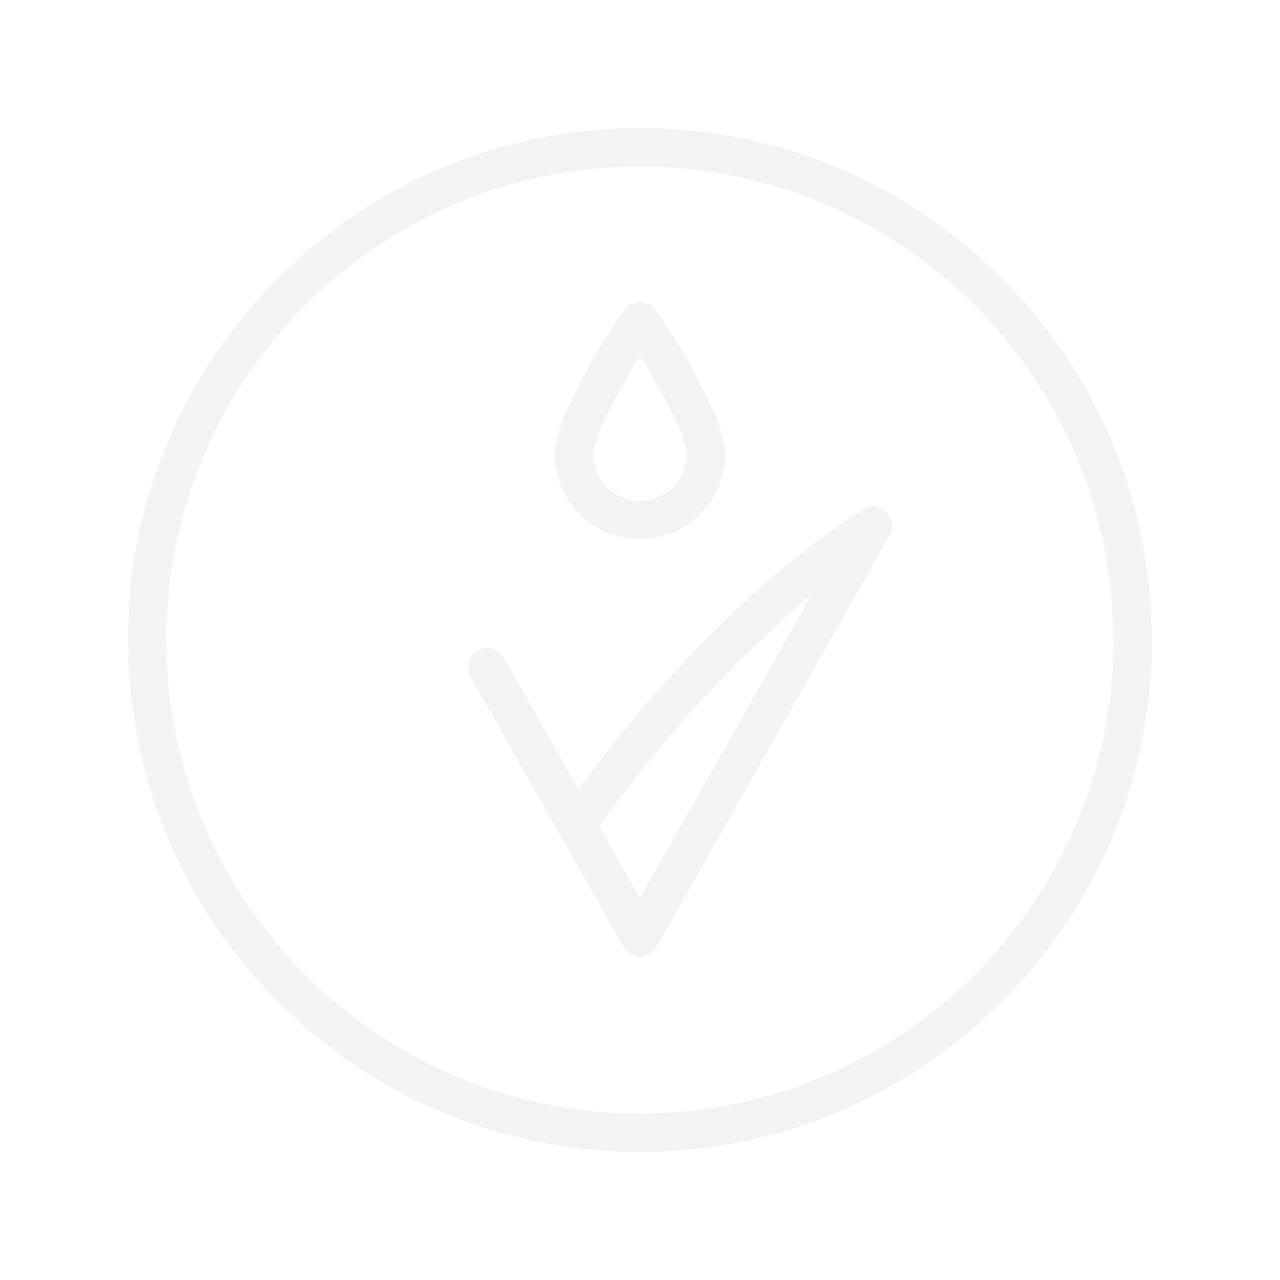 BOURJOIS Magic 1 Second Nail Polish Remover 75ml